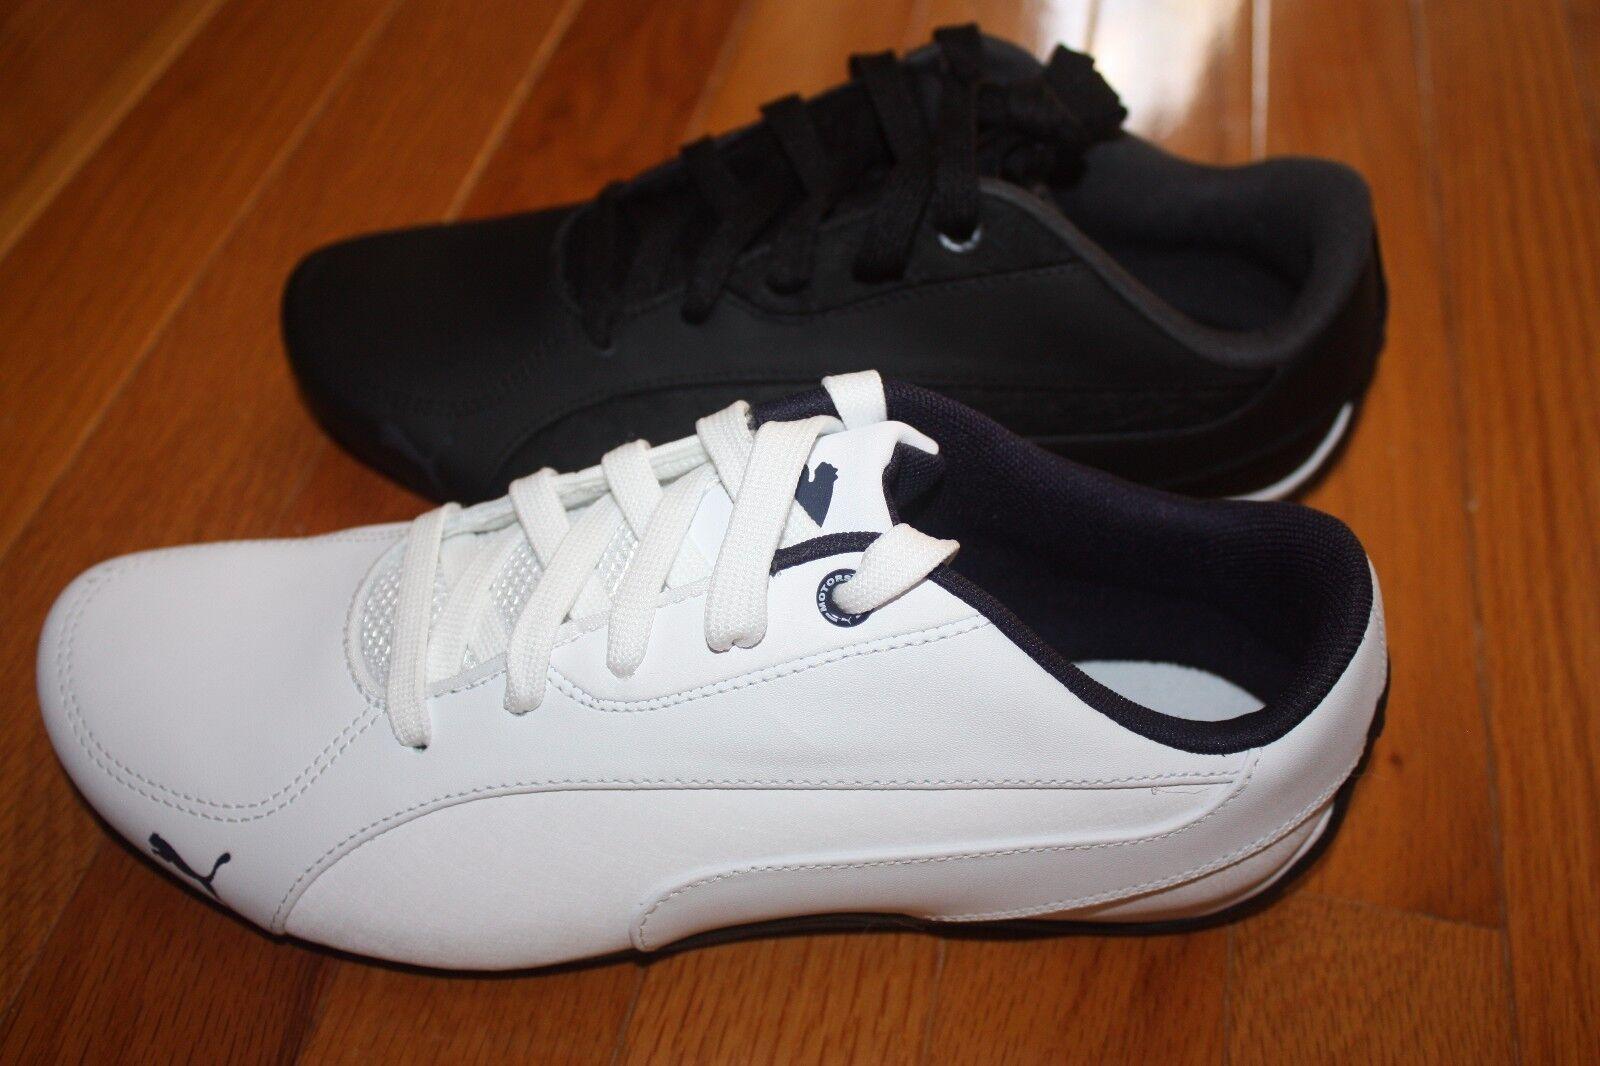 3cb6acc28ae28f Puma Puma Cat Box Drift In Brand 5 New Schuhe Männer Männer Männer FWaztt